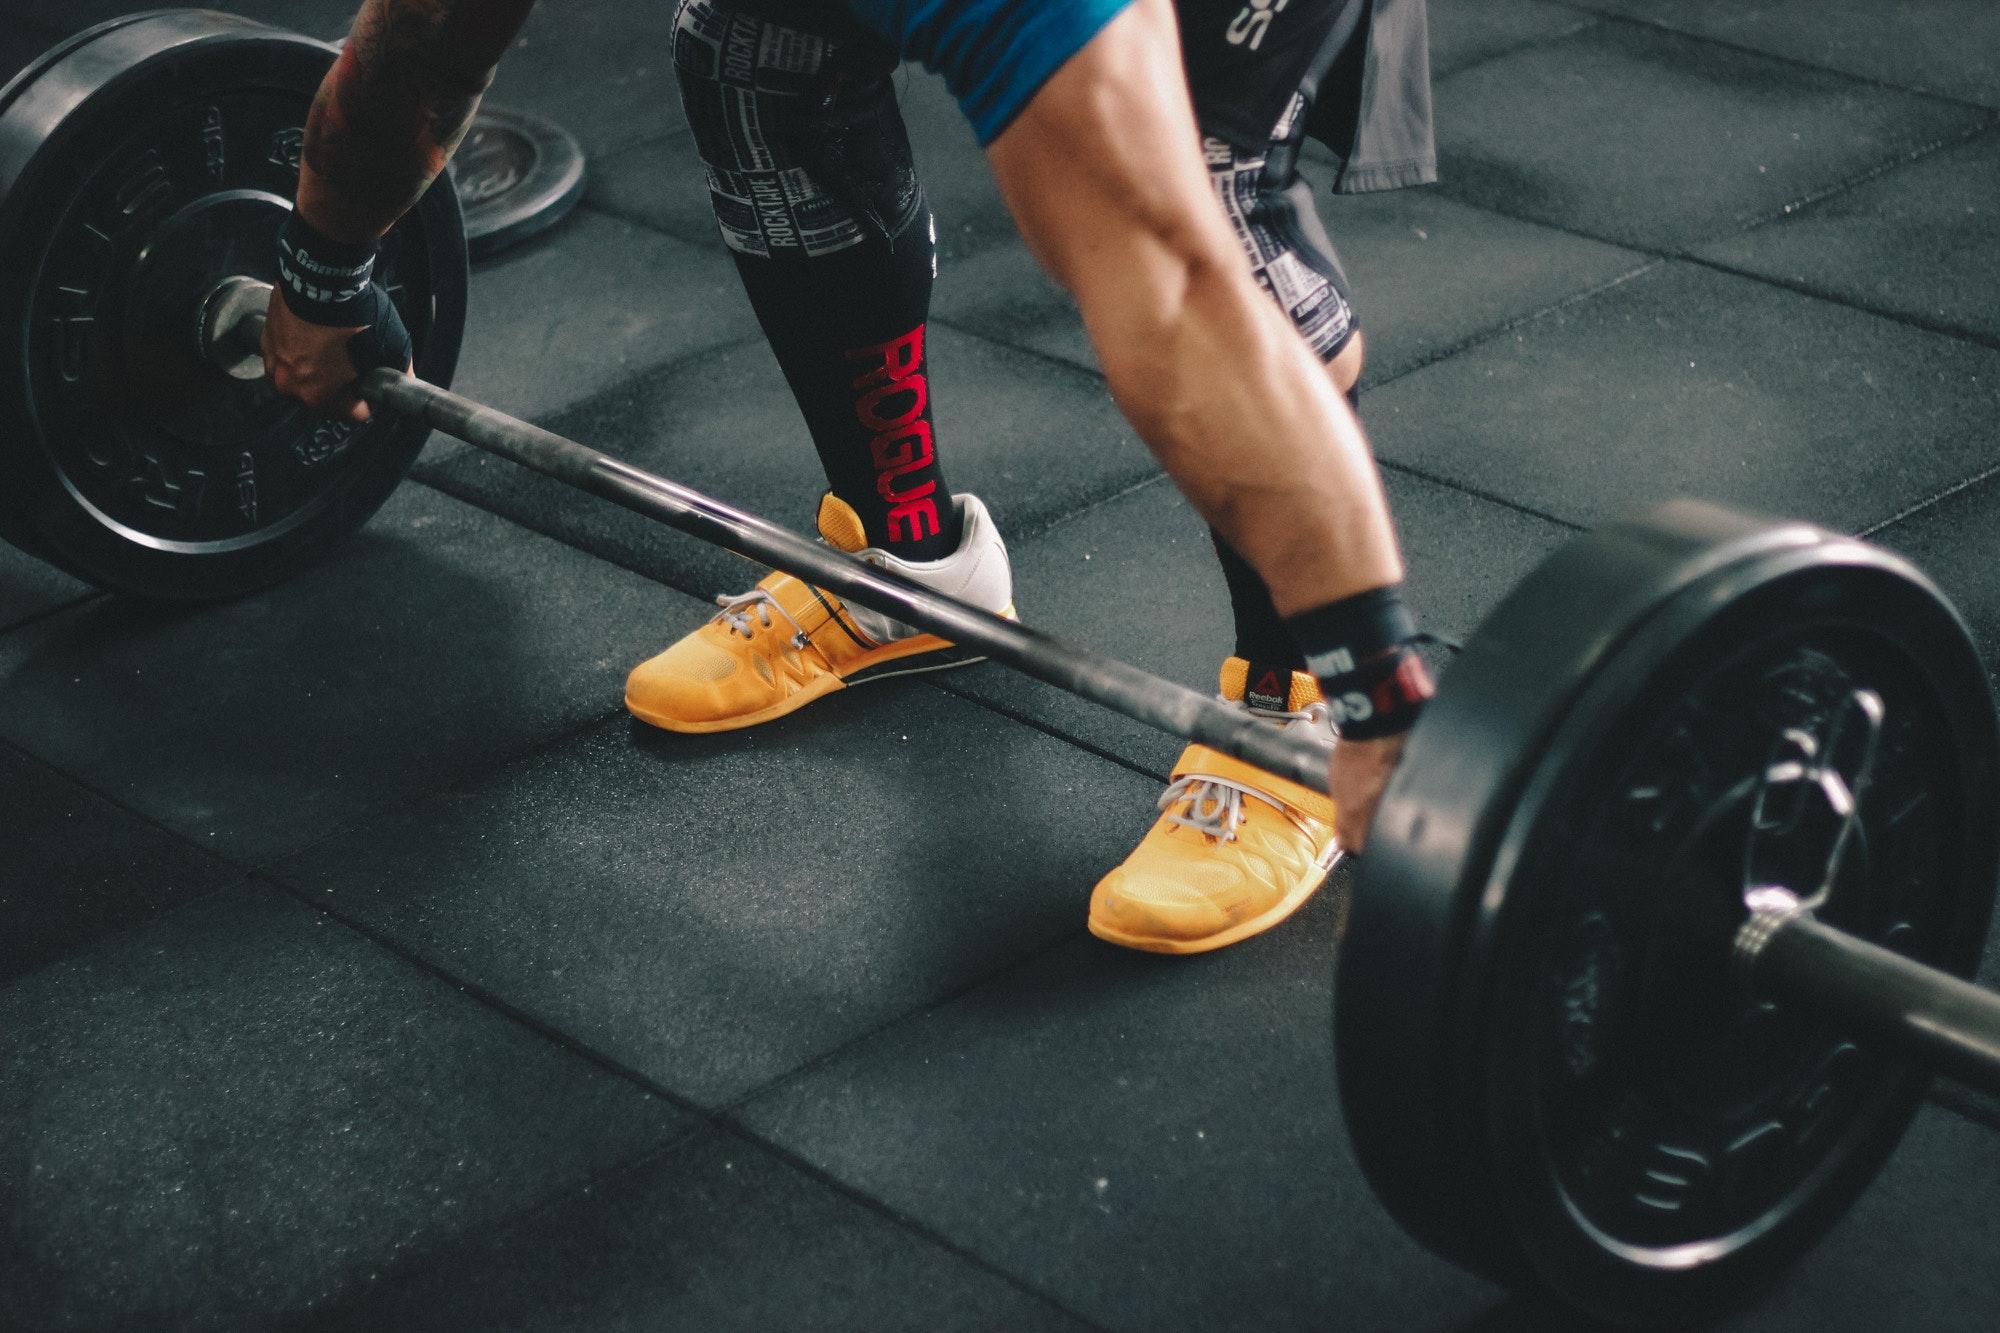 BodyBoss Portable Gym Discount Coder